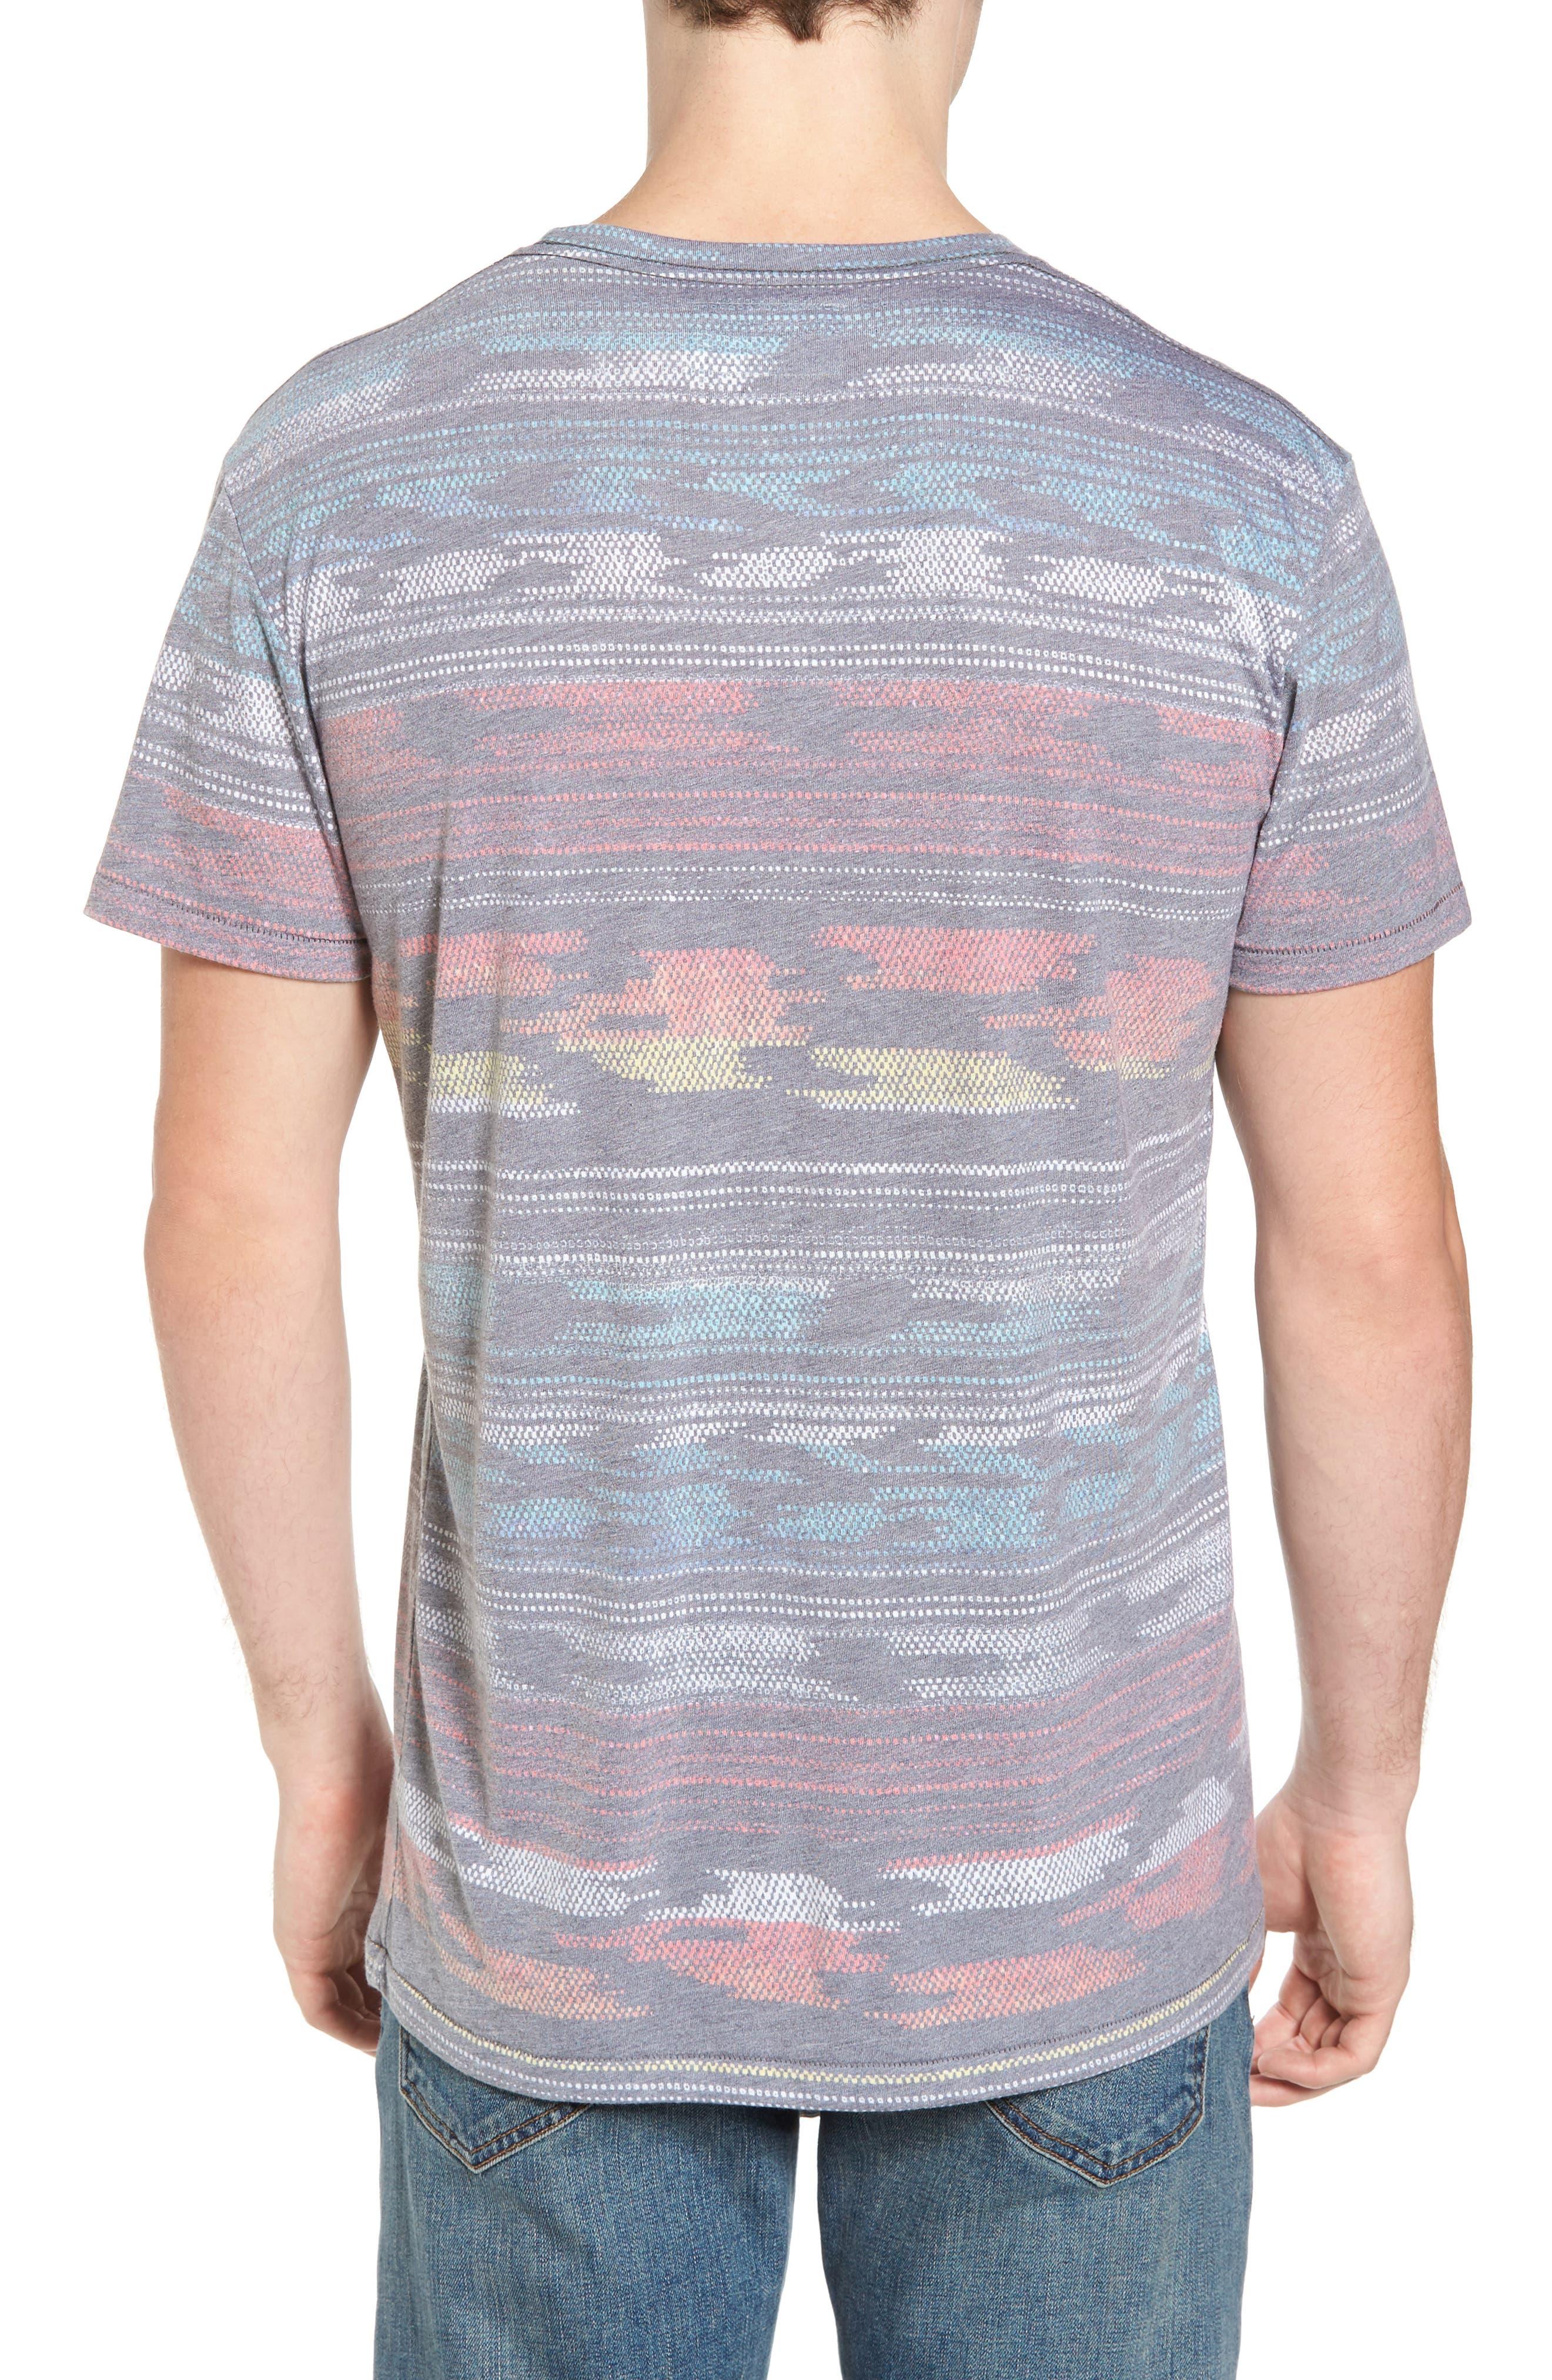 Madrugada T-Shirt,                             Alternate thumbnail 2, color,